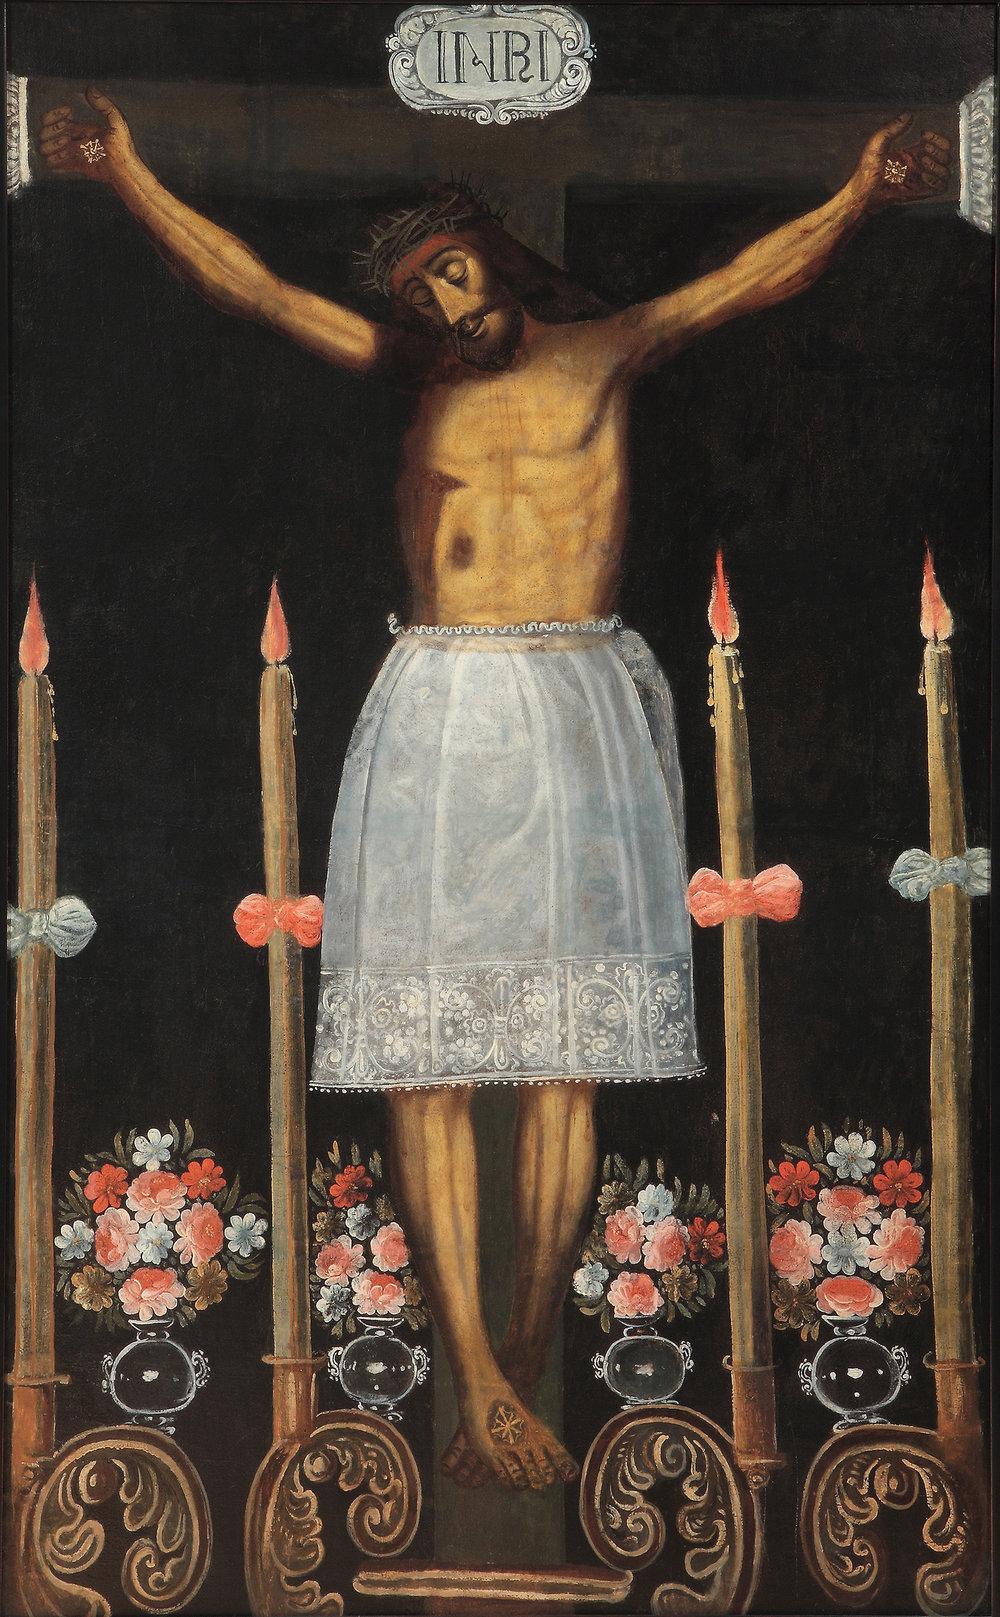 Spanish Colonial, Peruvian, Cuzco, Eighteenth Century,  Christ of the Earthquakes